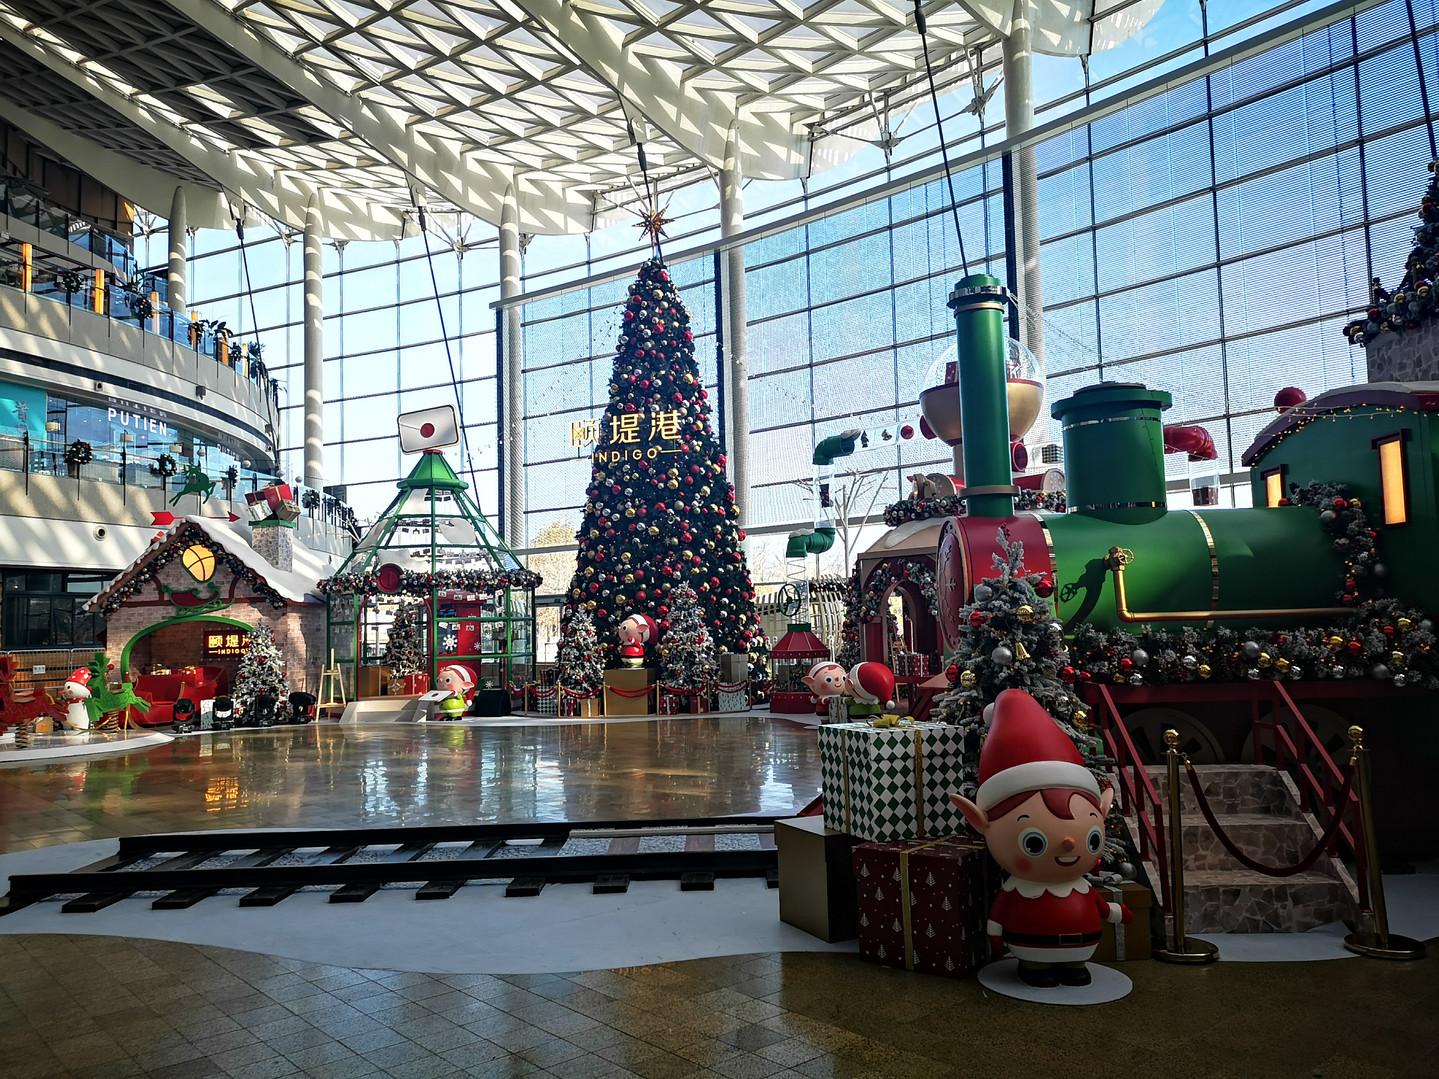 Beijing Indigo Christmas Project 北京颐堤港圣诞 项目 2018